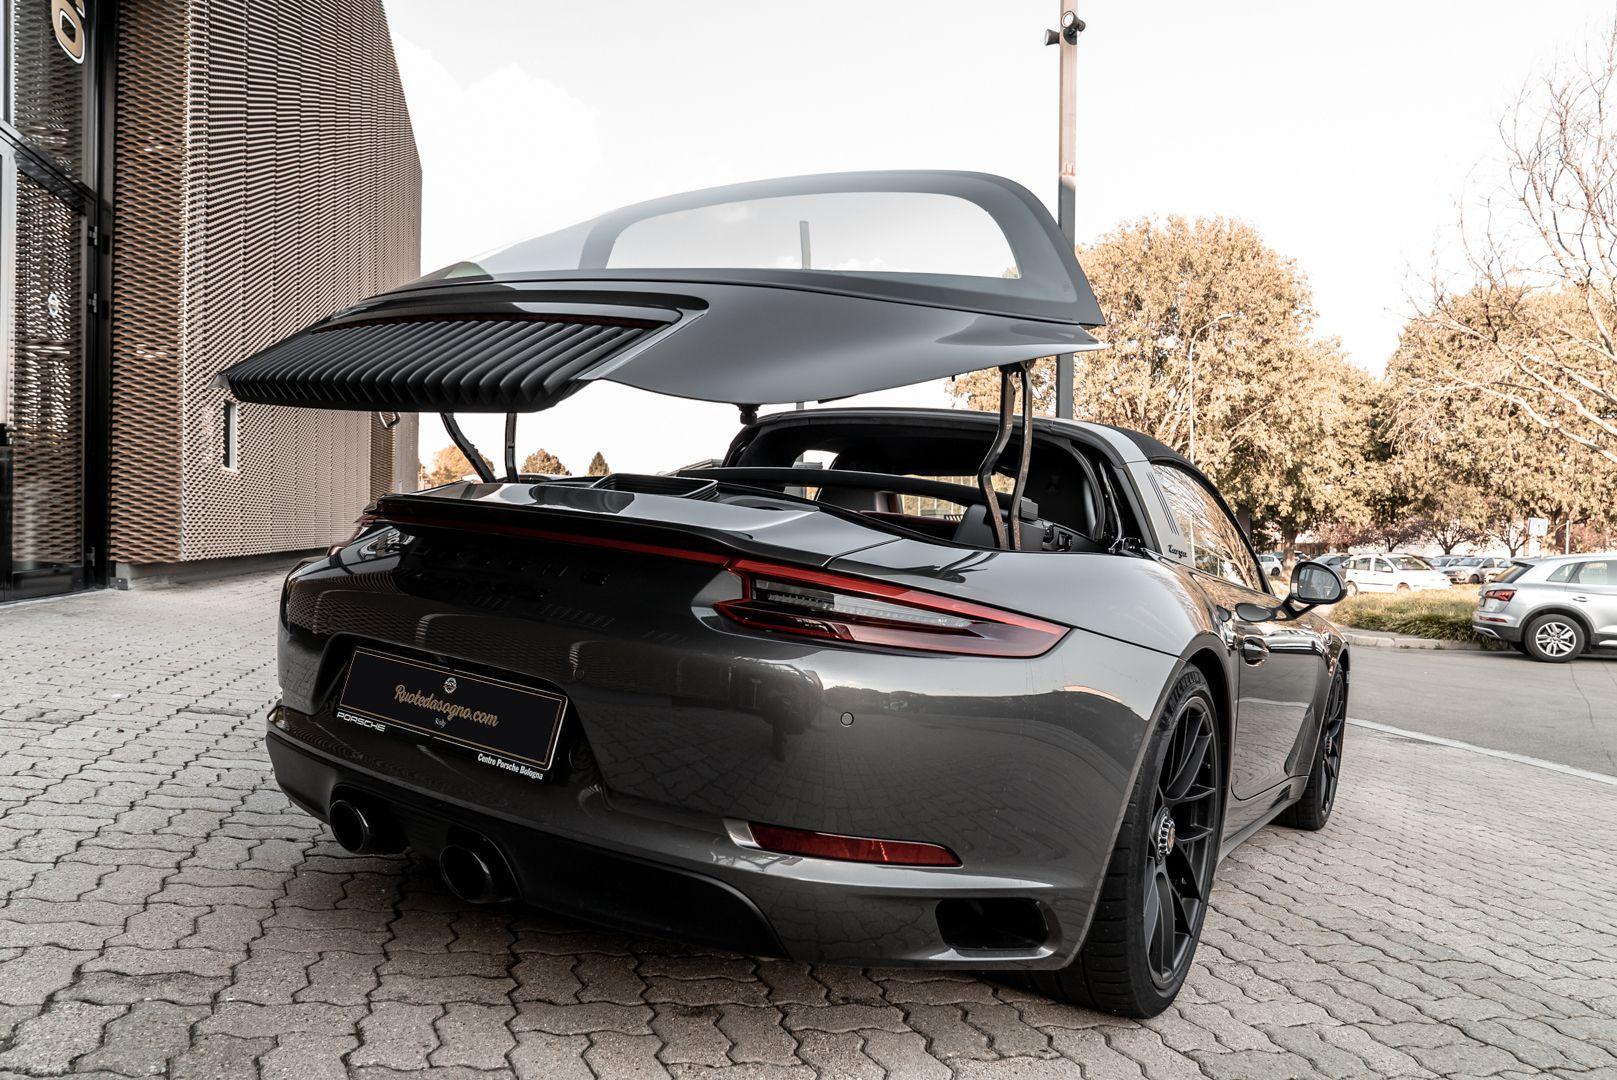 2018 Porsche 911 Targa 4 GTS 85276